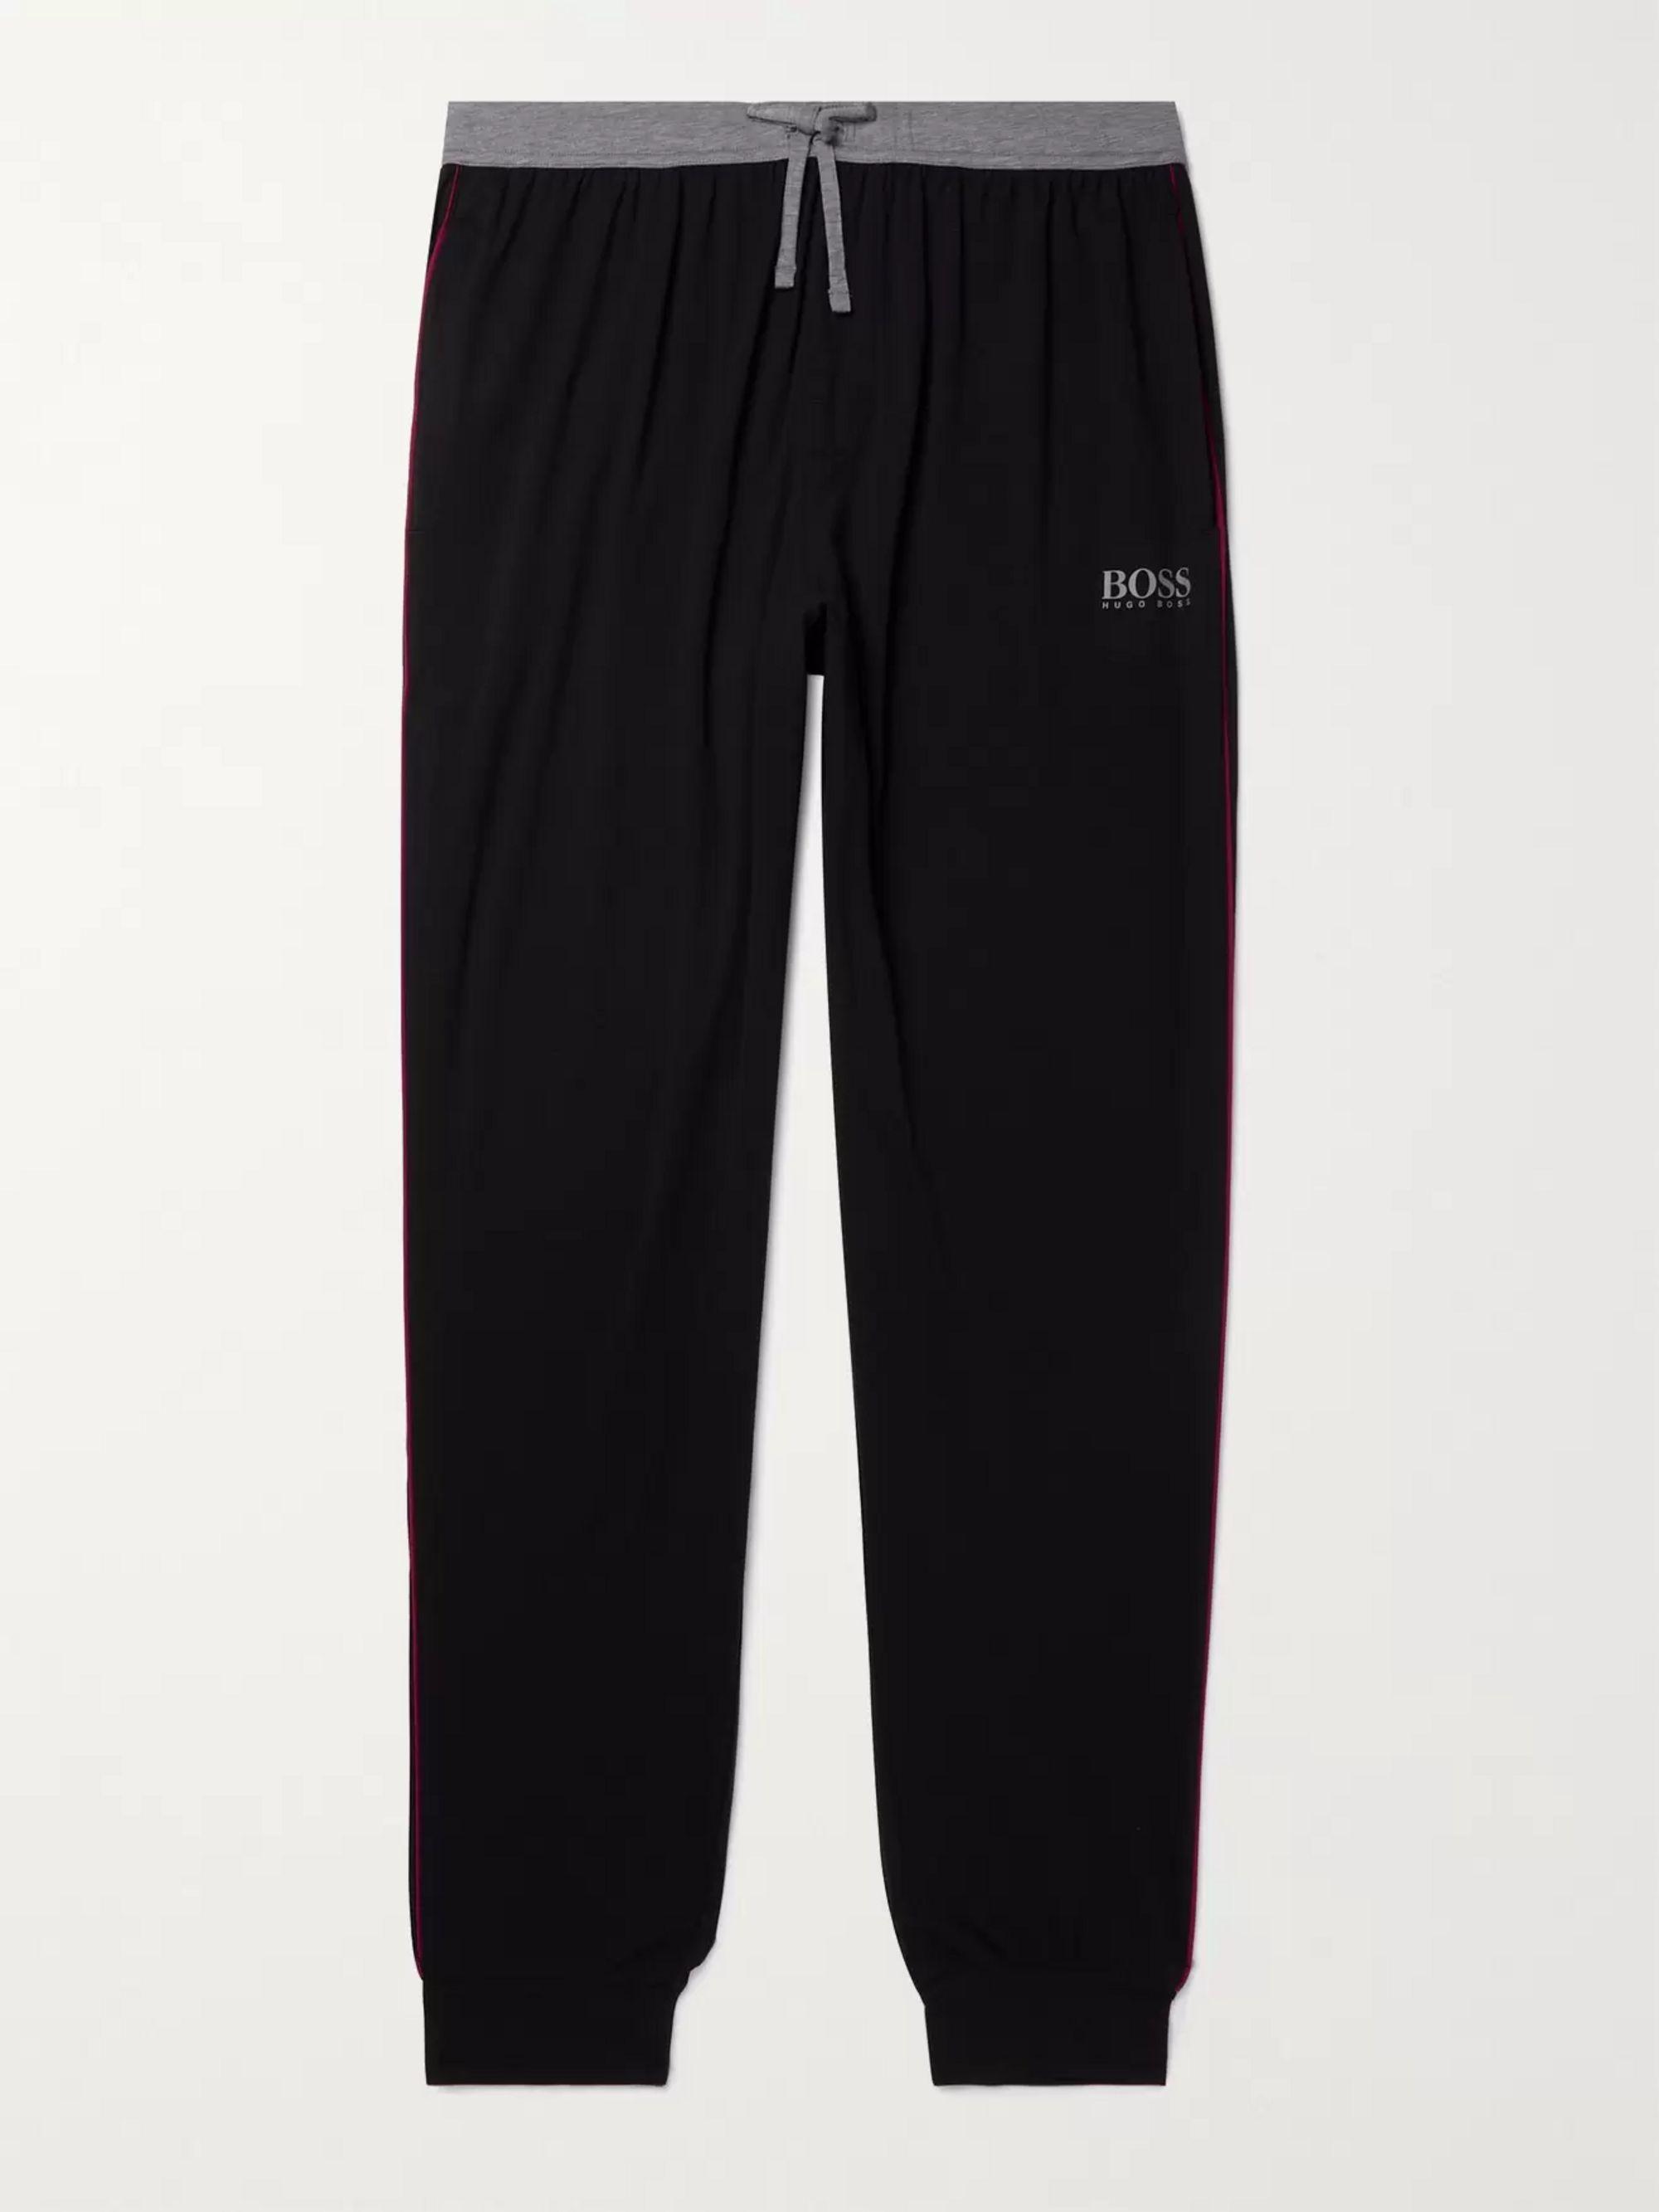 HUGO BOSS Balance Tapered Stretch Cotton and Modal-Blend Jersey Pyjama Trousers